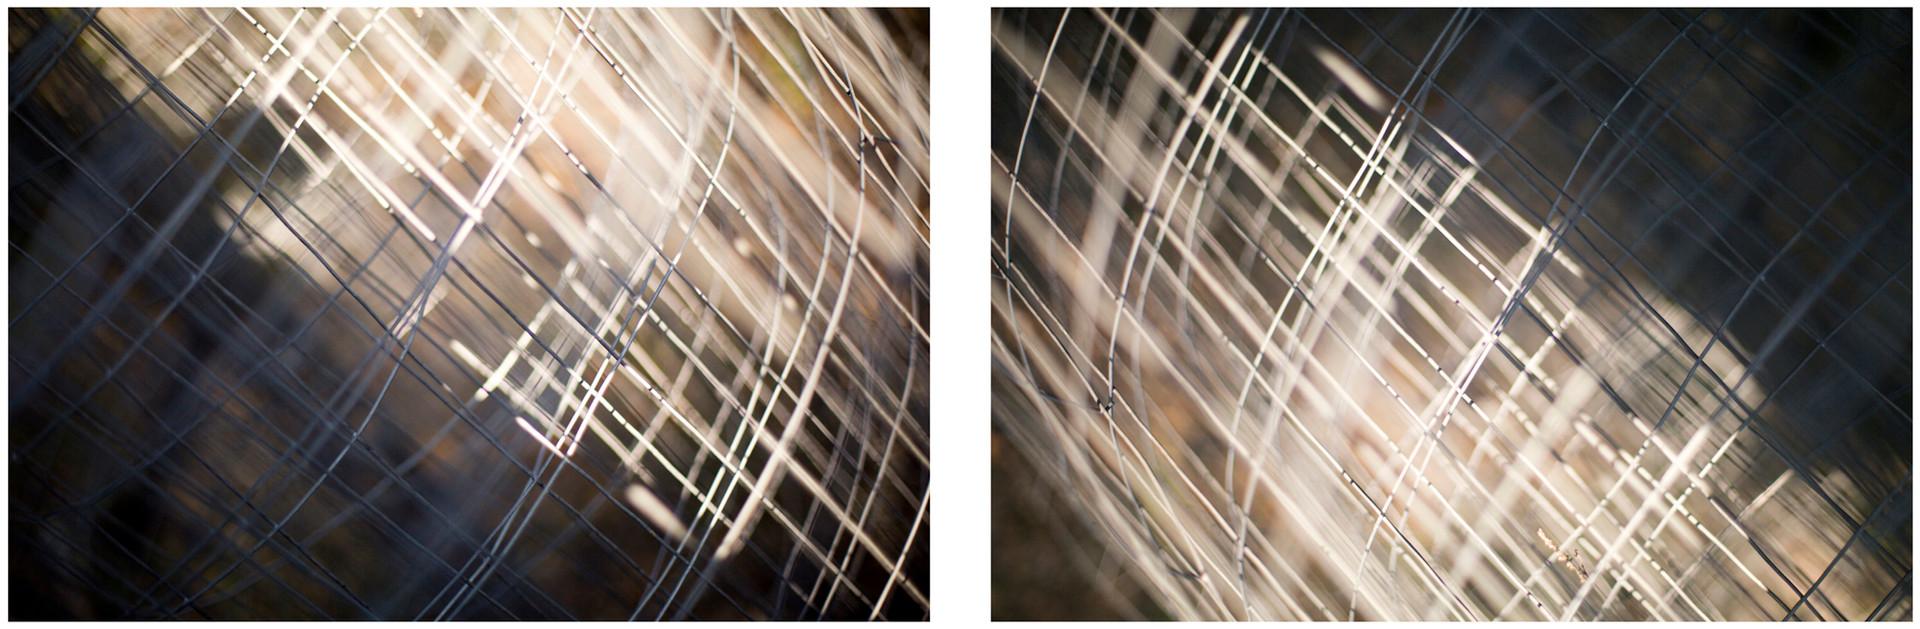 "17. ""The Inner Dawn"", 2014, by Ryan J. Bush"